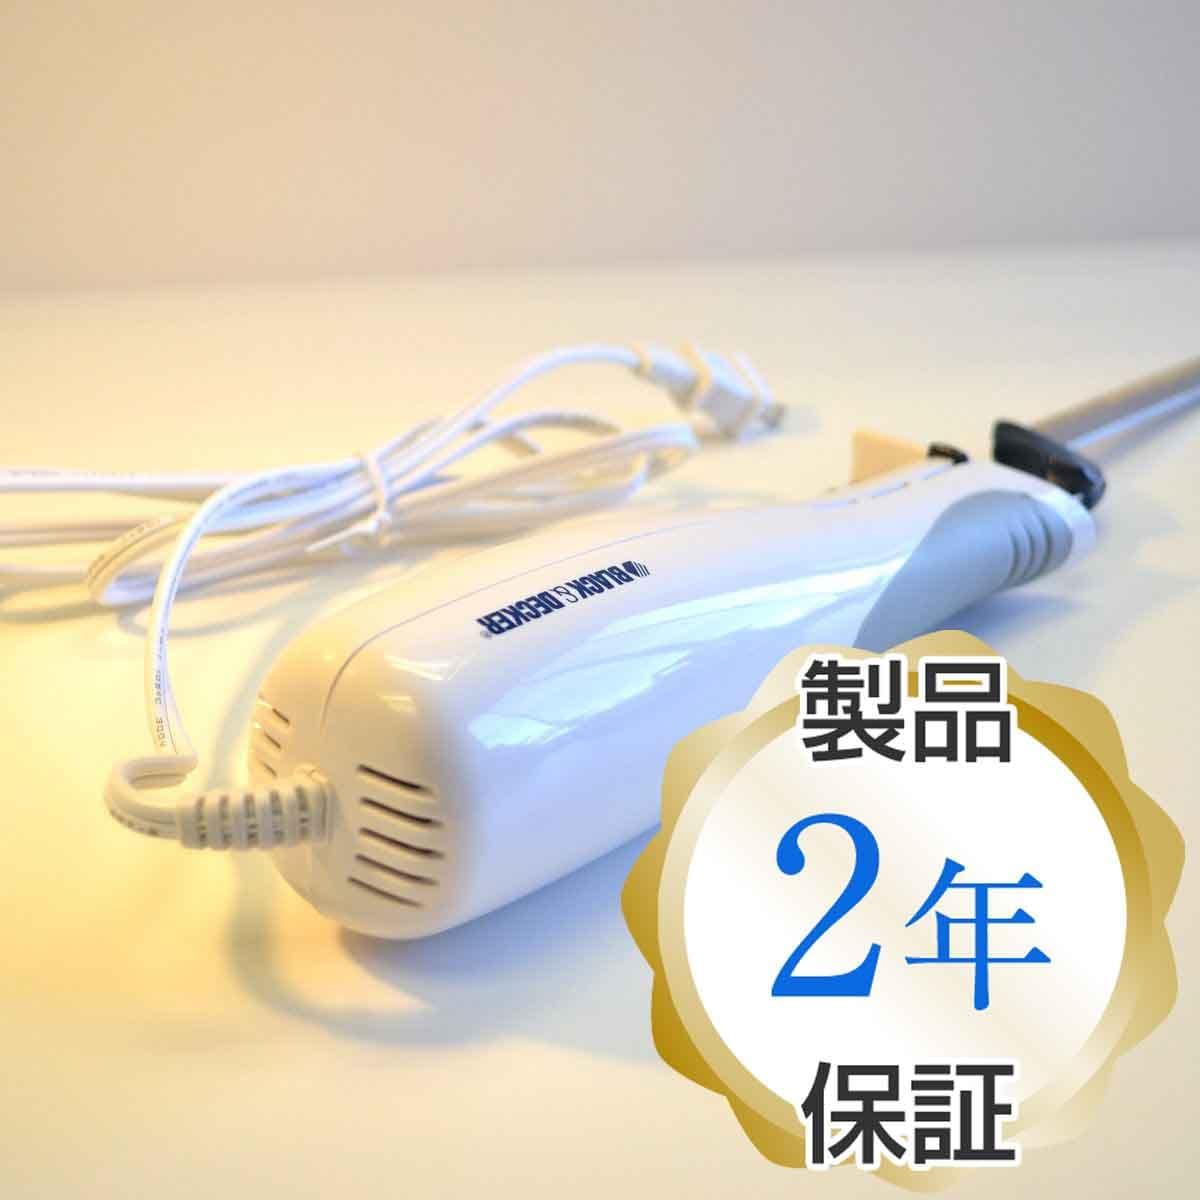 家庭用電動ナイフ Black & Decker EK700 9-Inch Electric Carving Knife,white